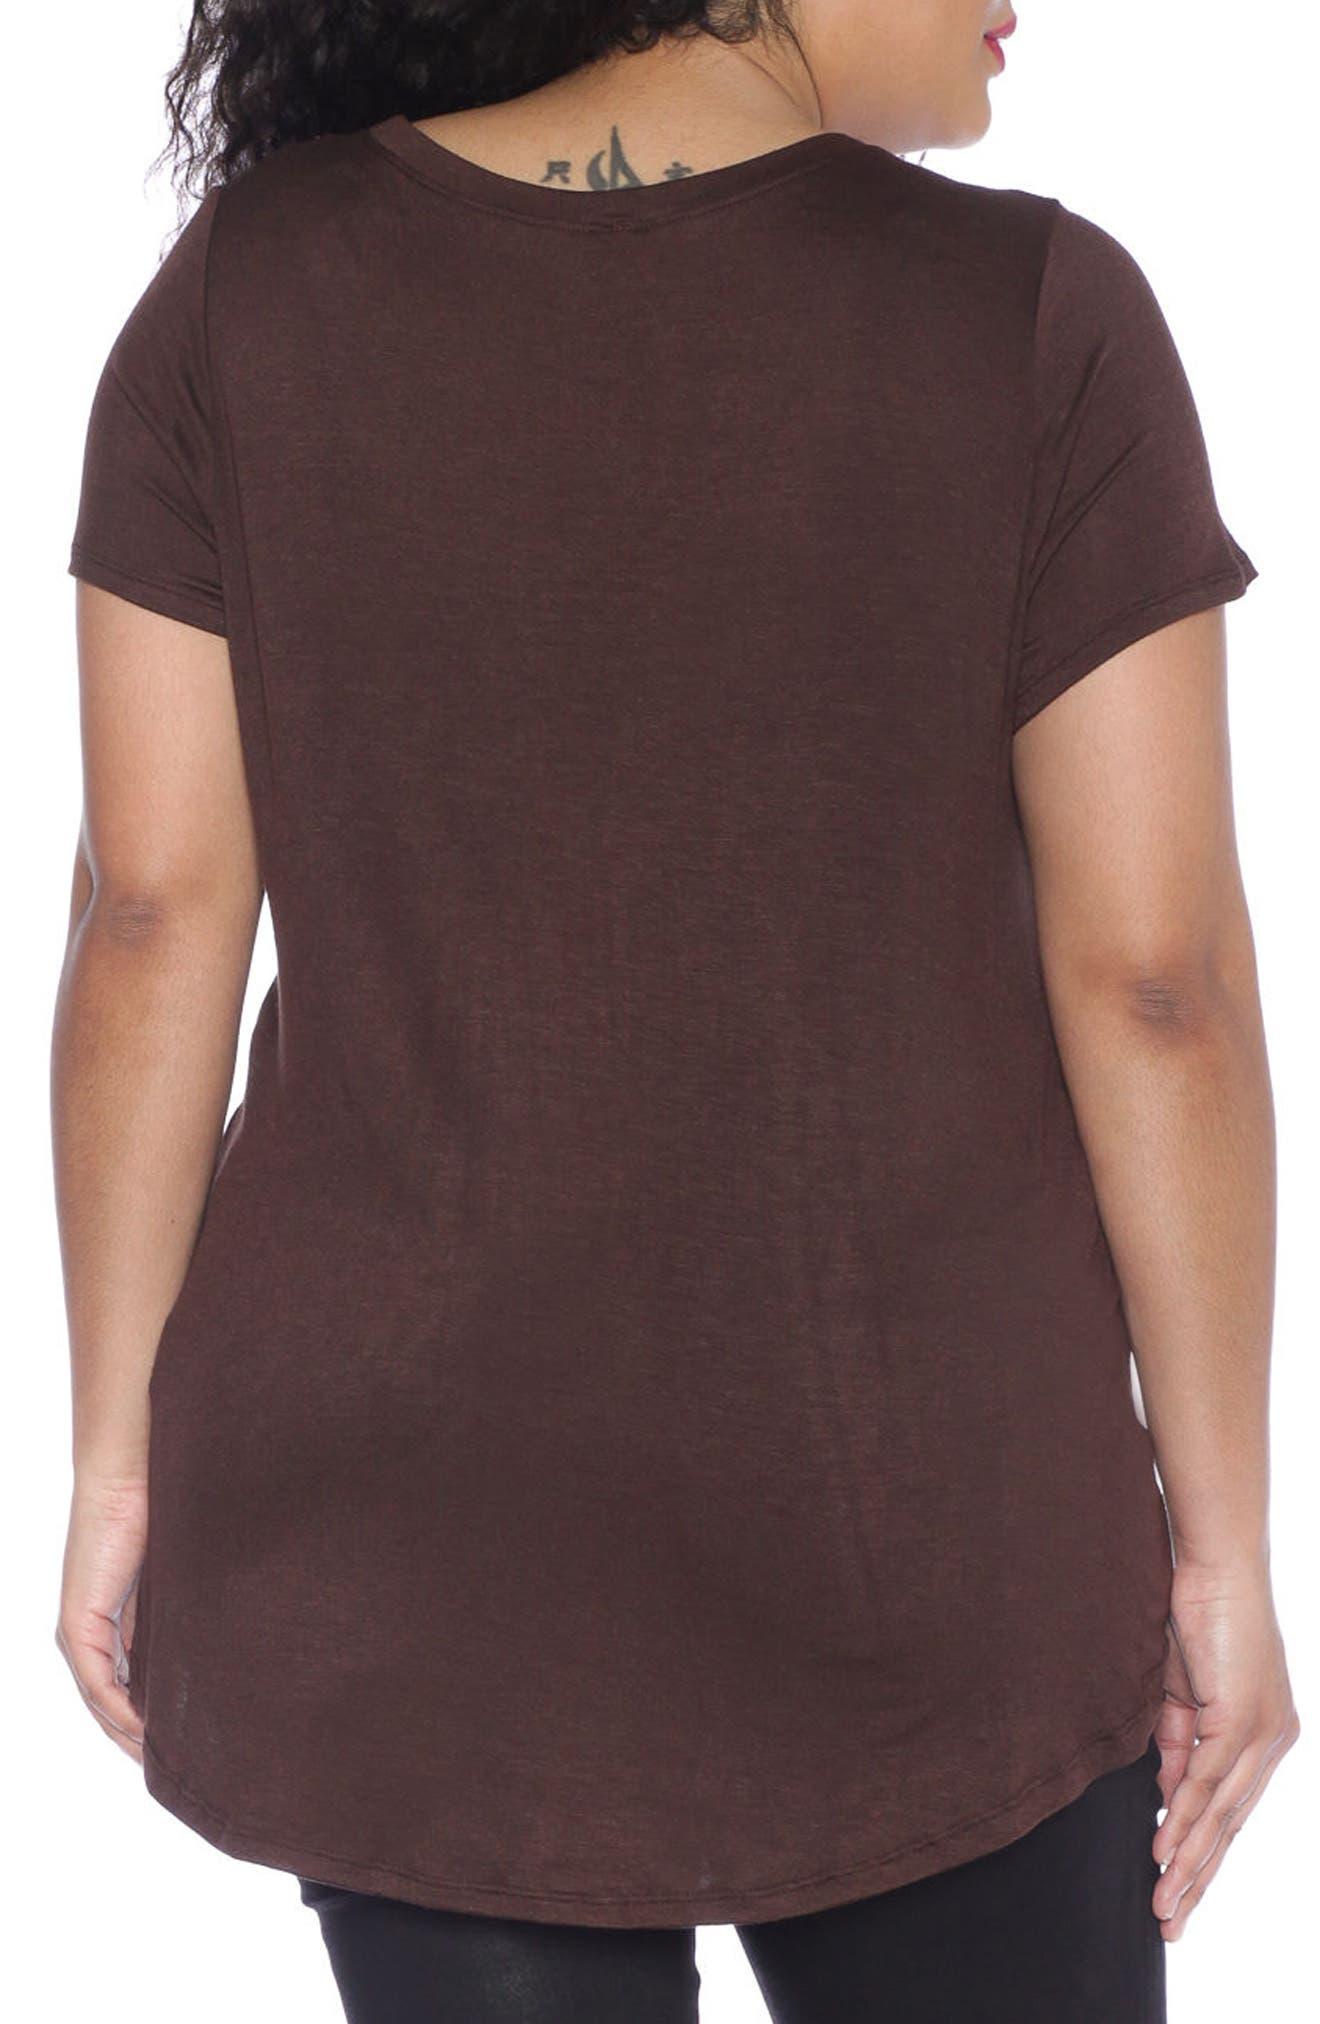 Alternate Image 2  - SLINK Jeans High/Low Scoop Neck Tee (Plus Size)